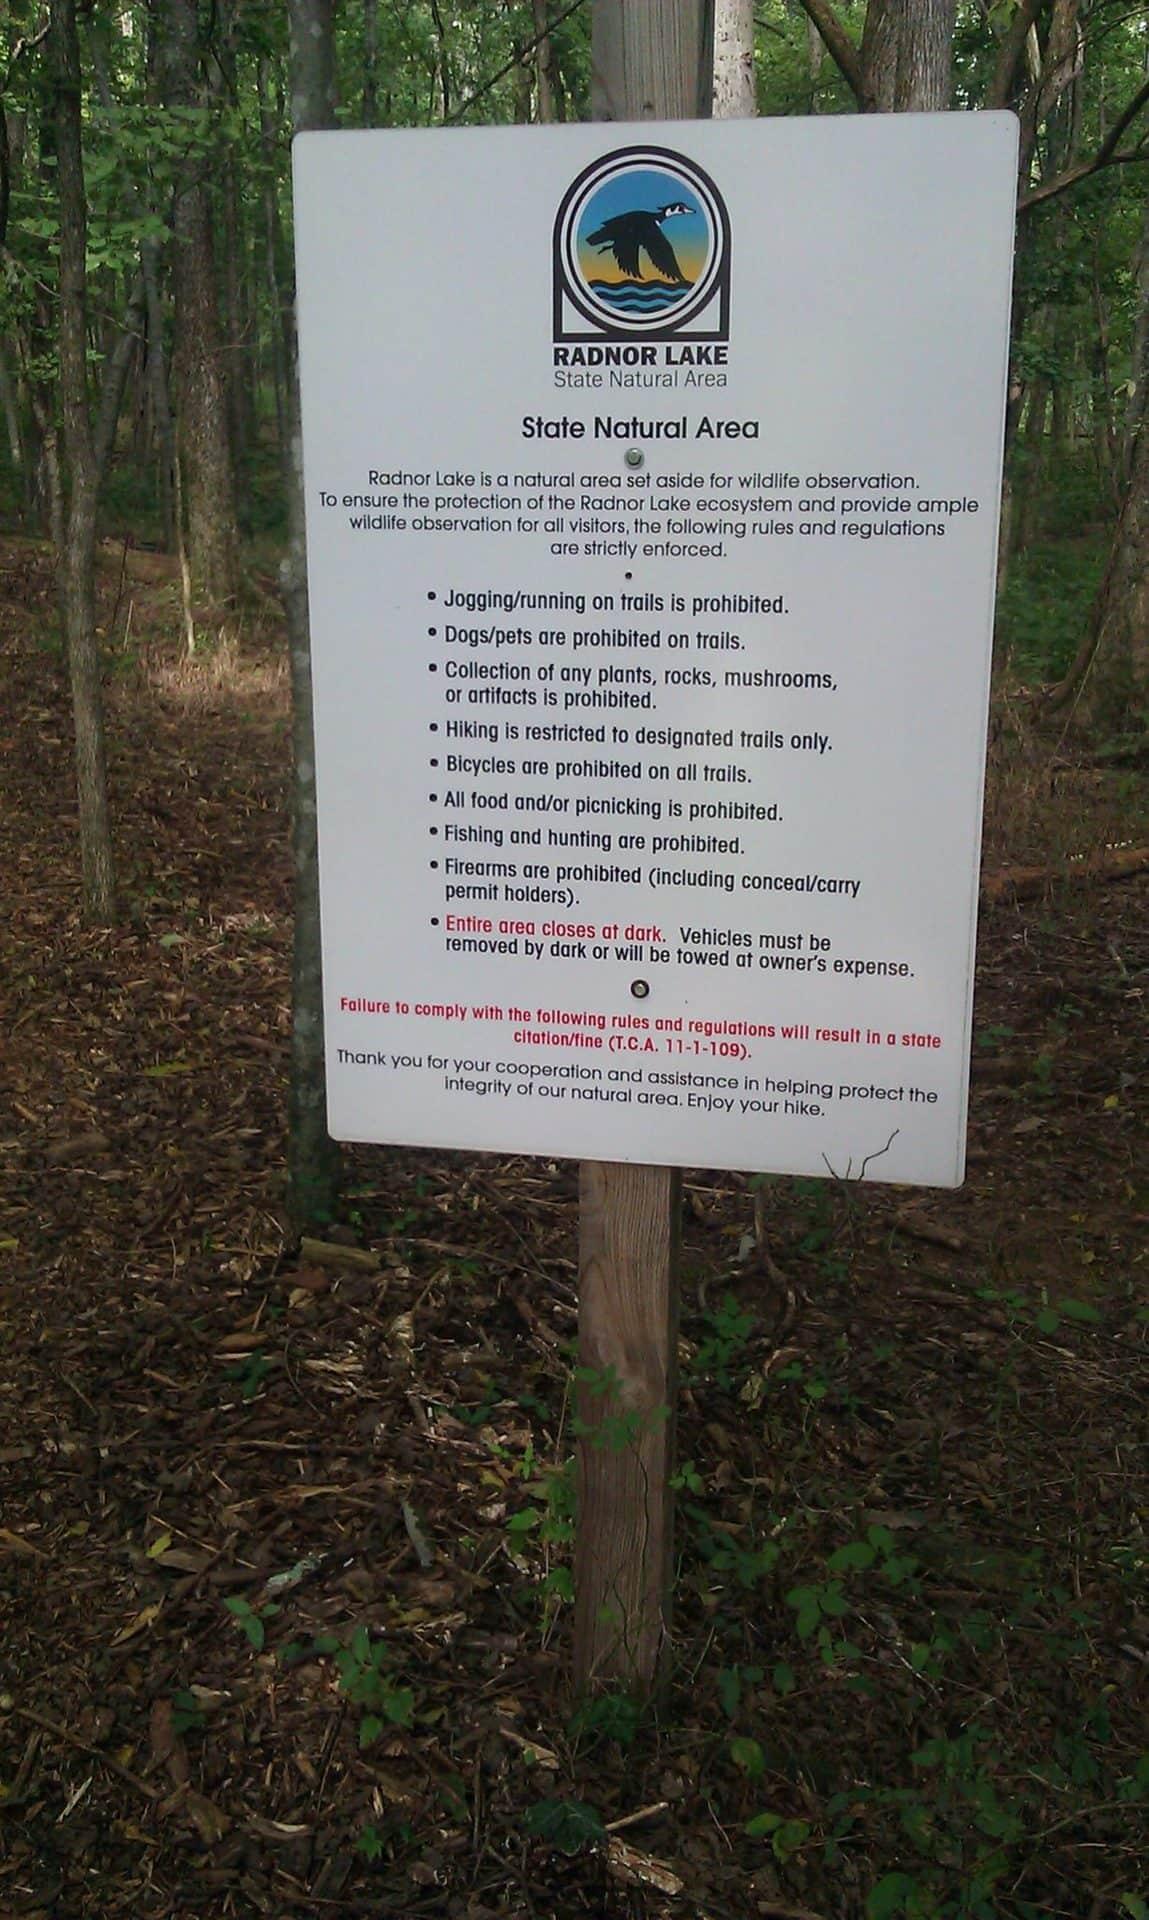 Radnor Lake - trail rules